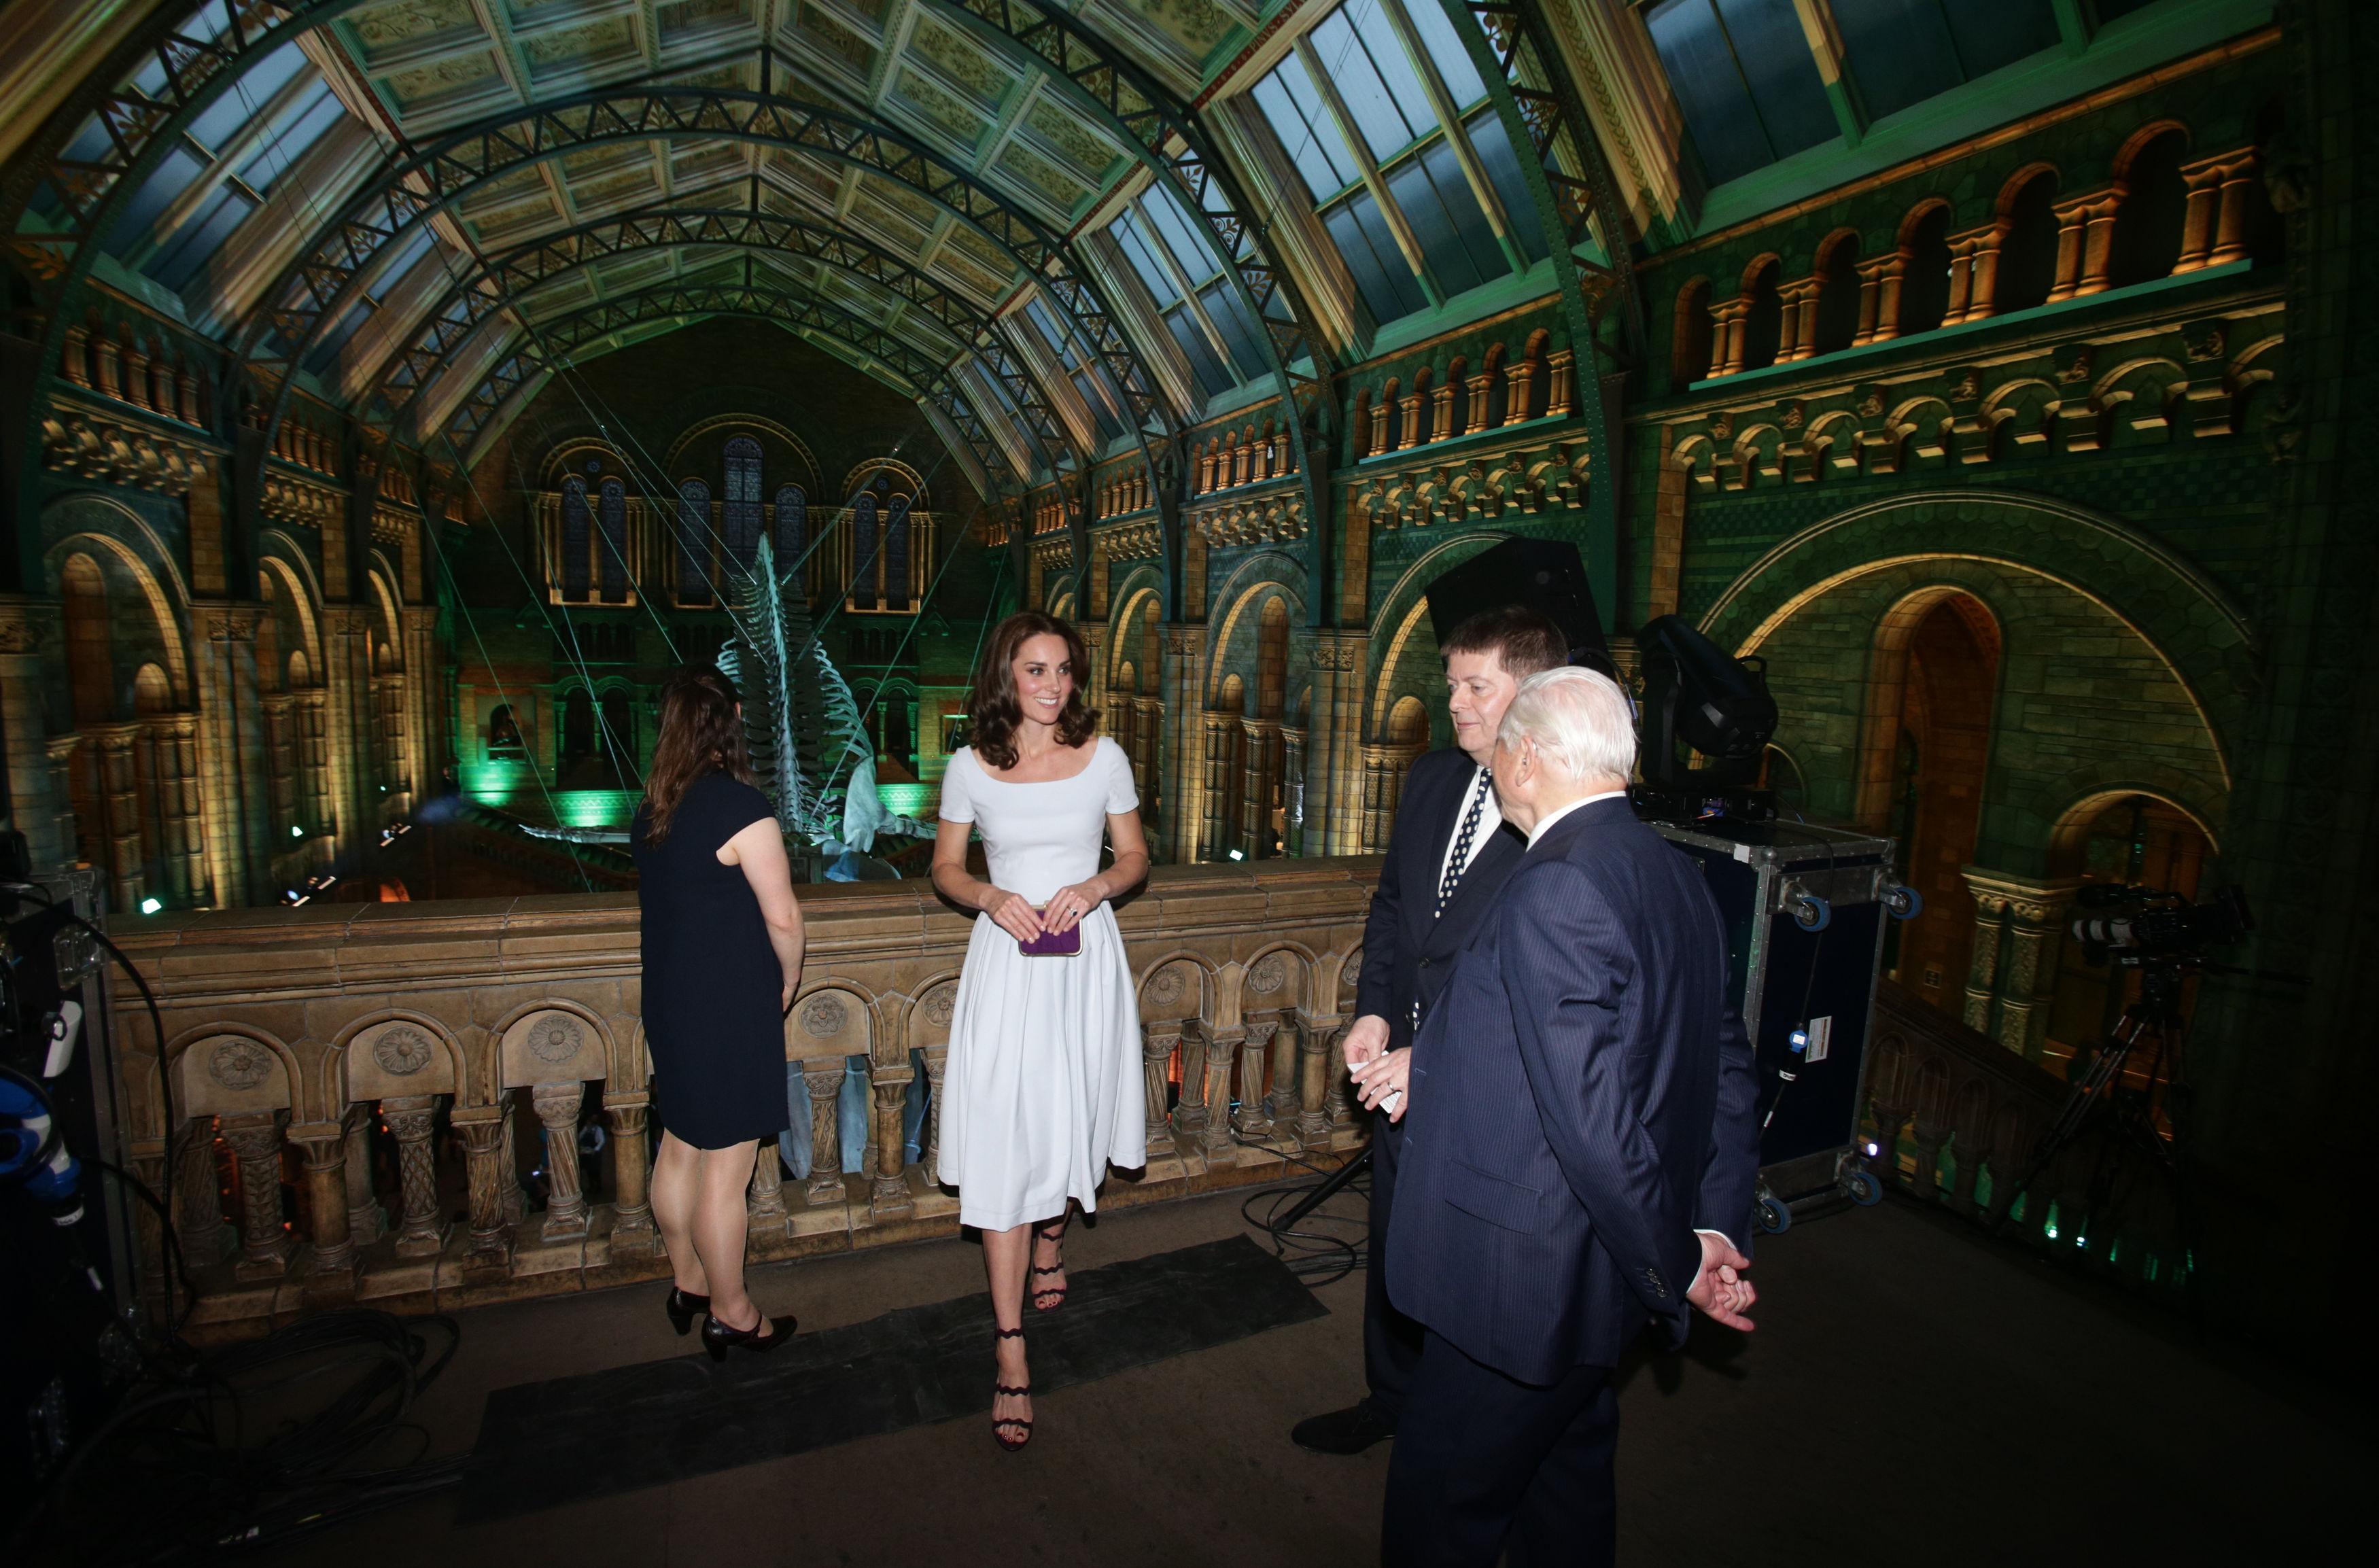 Duchess of Cambridge Natural History Museum Hope